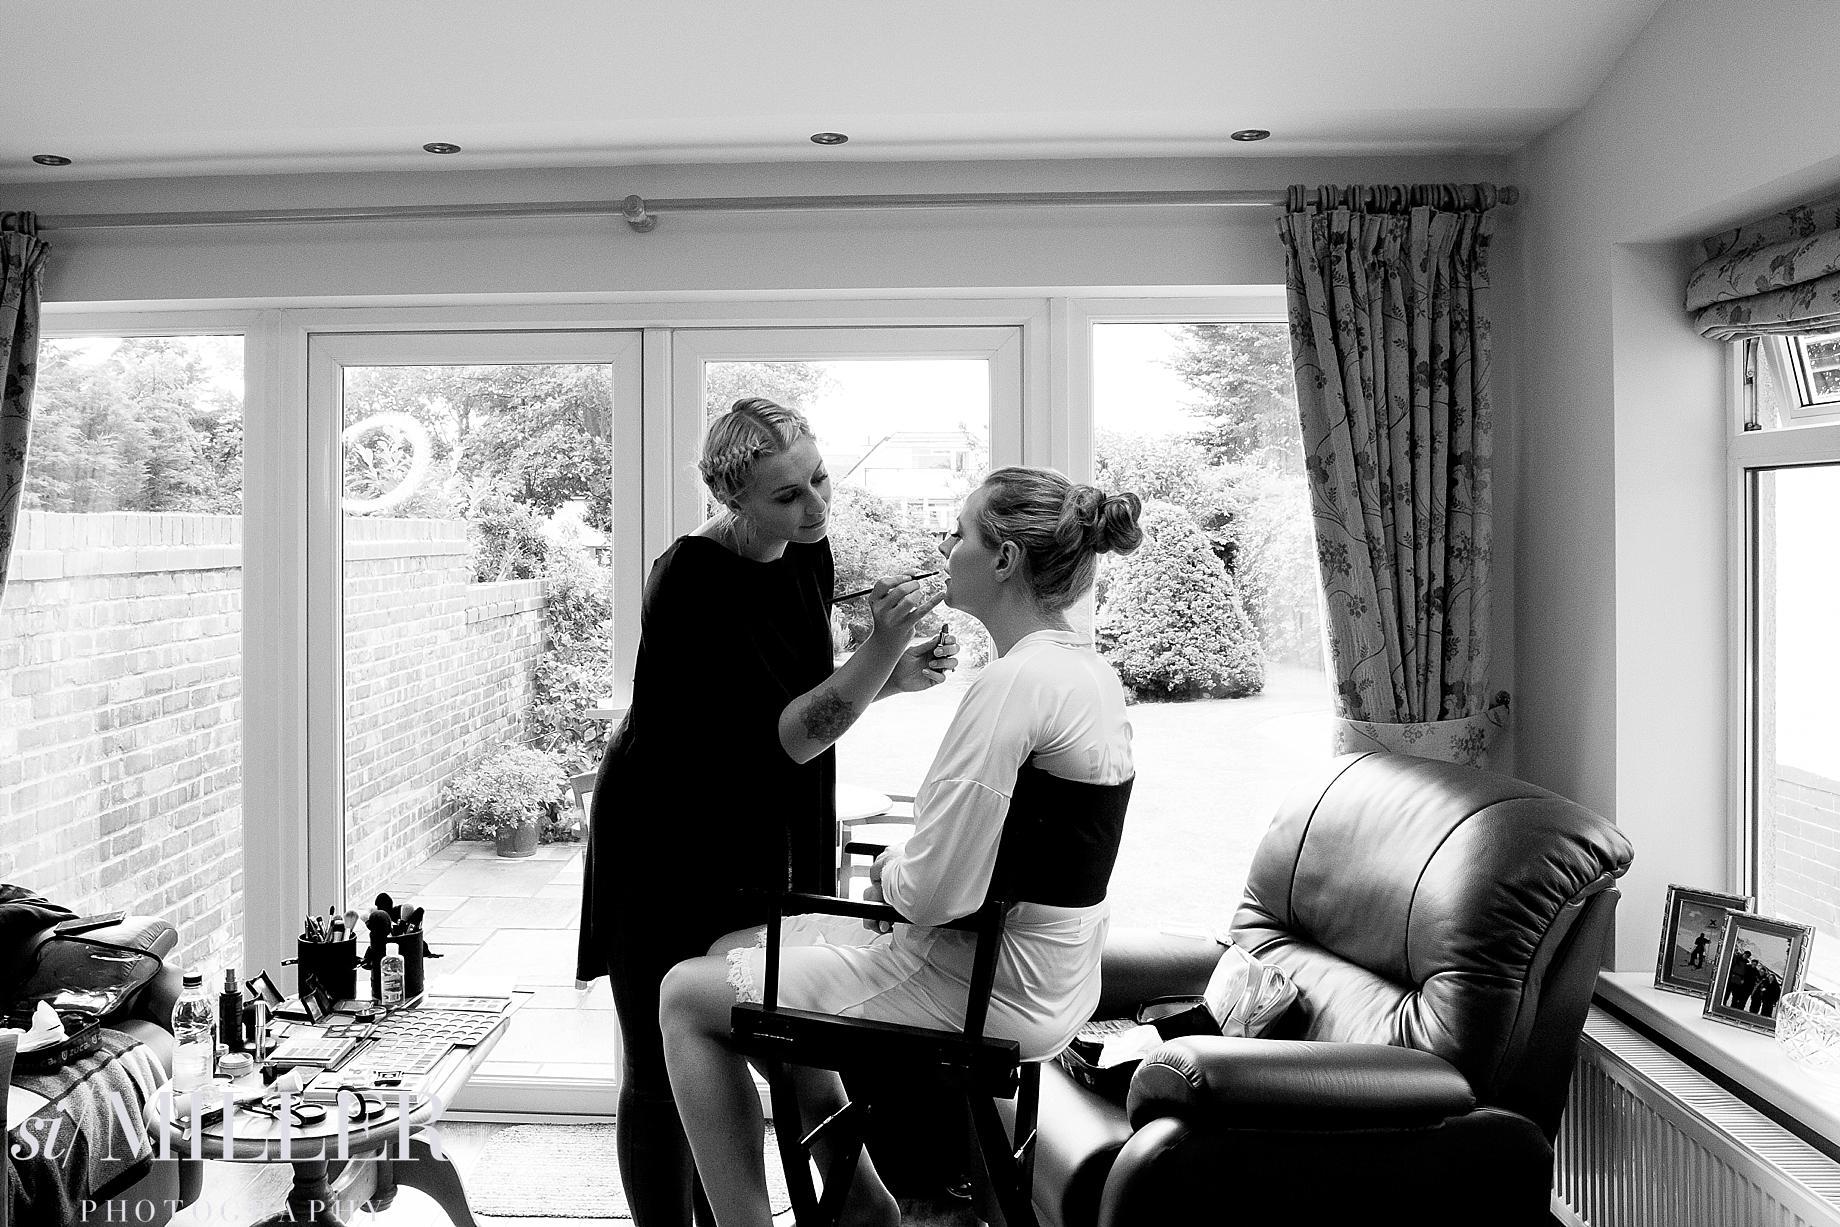 lytham St annes wedding photographer lancashire